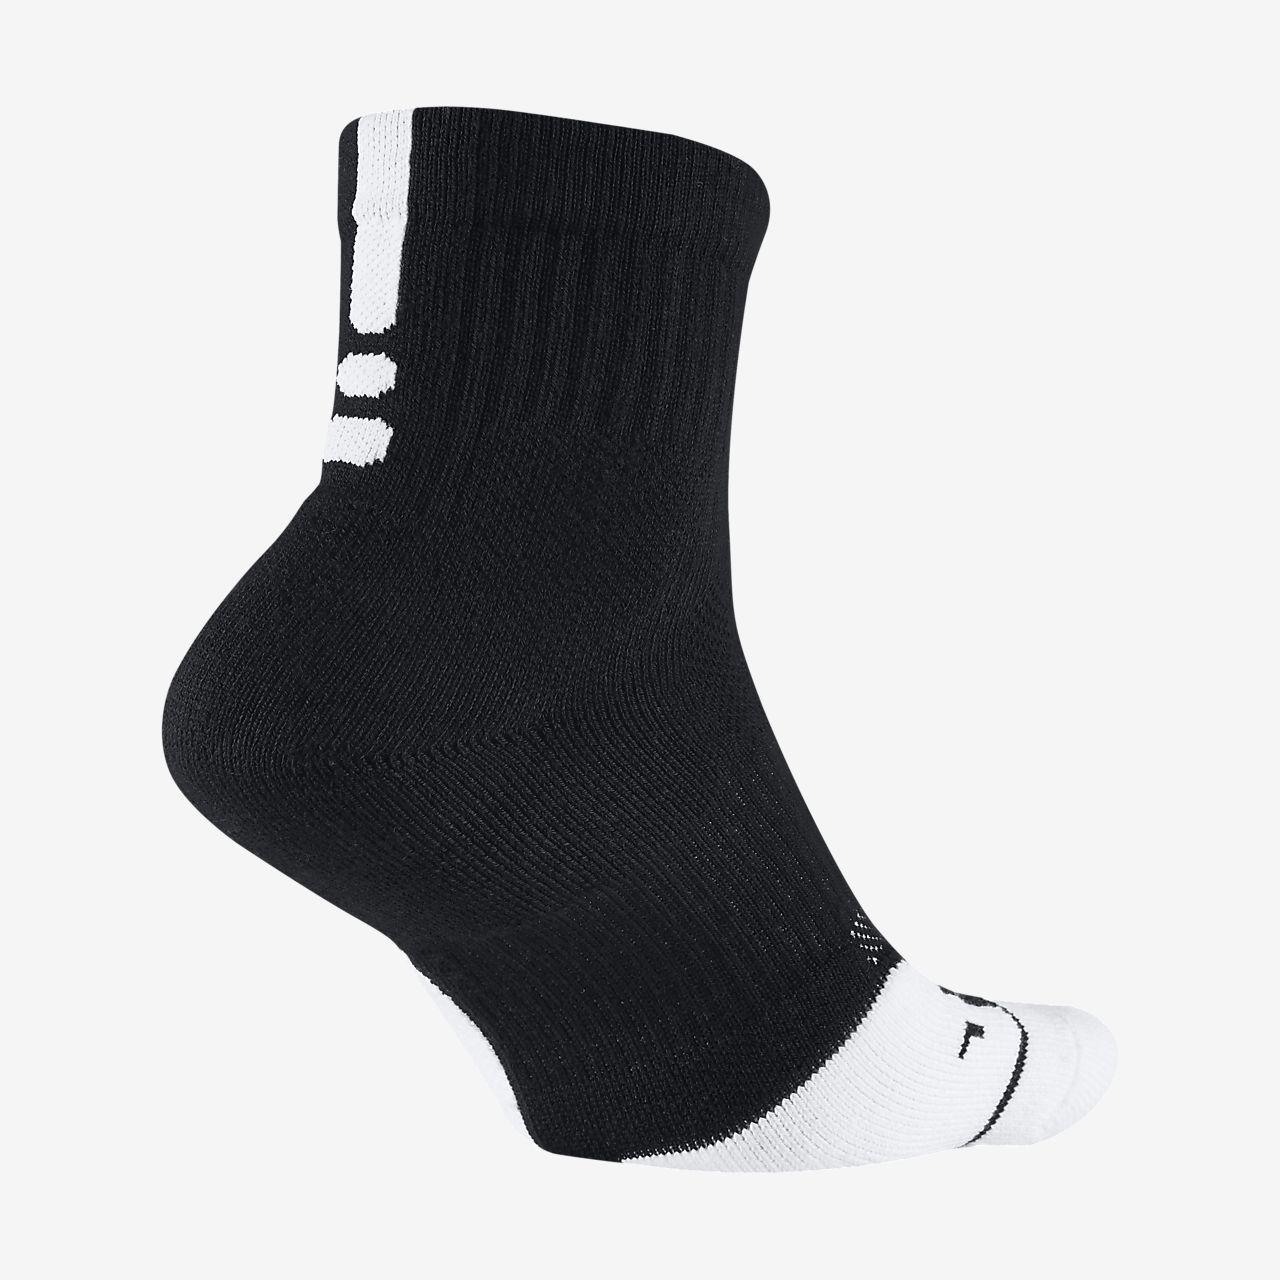 Calze da basket Nike Dry Elite 1.5 Mid. Nike.com IT 473757876879